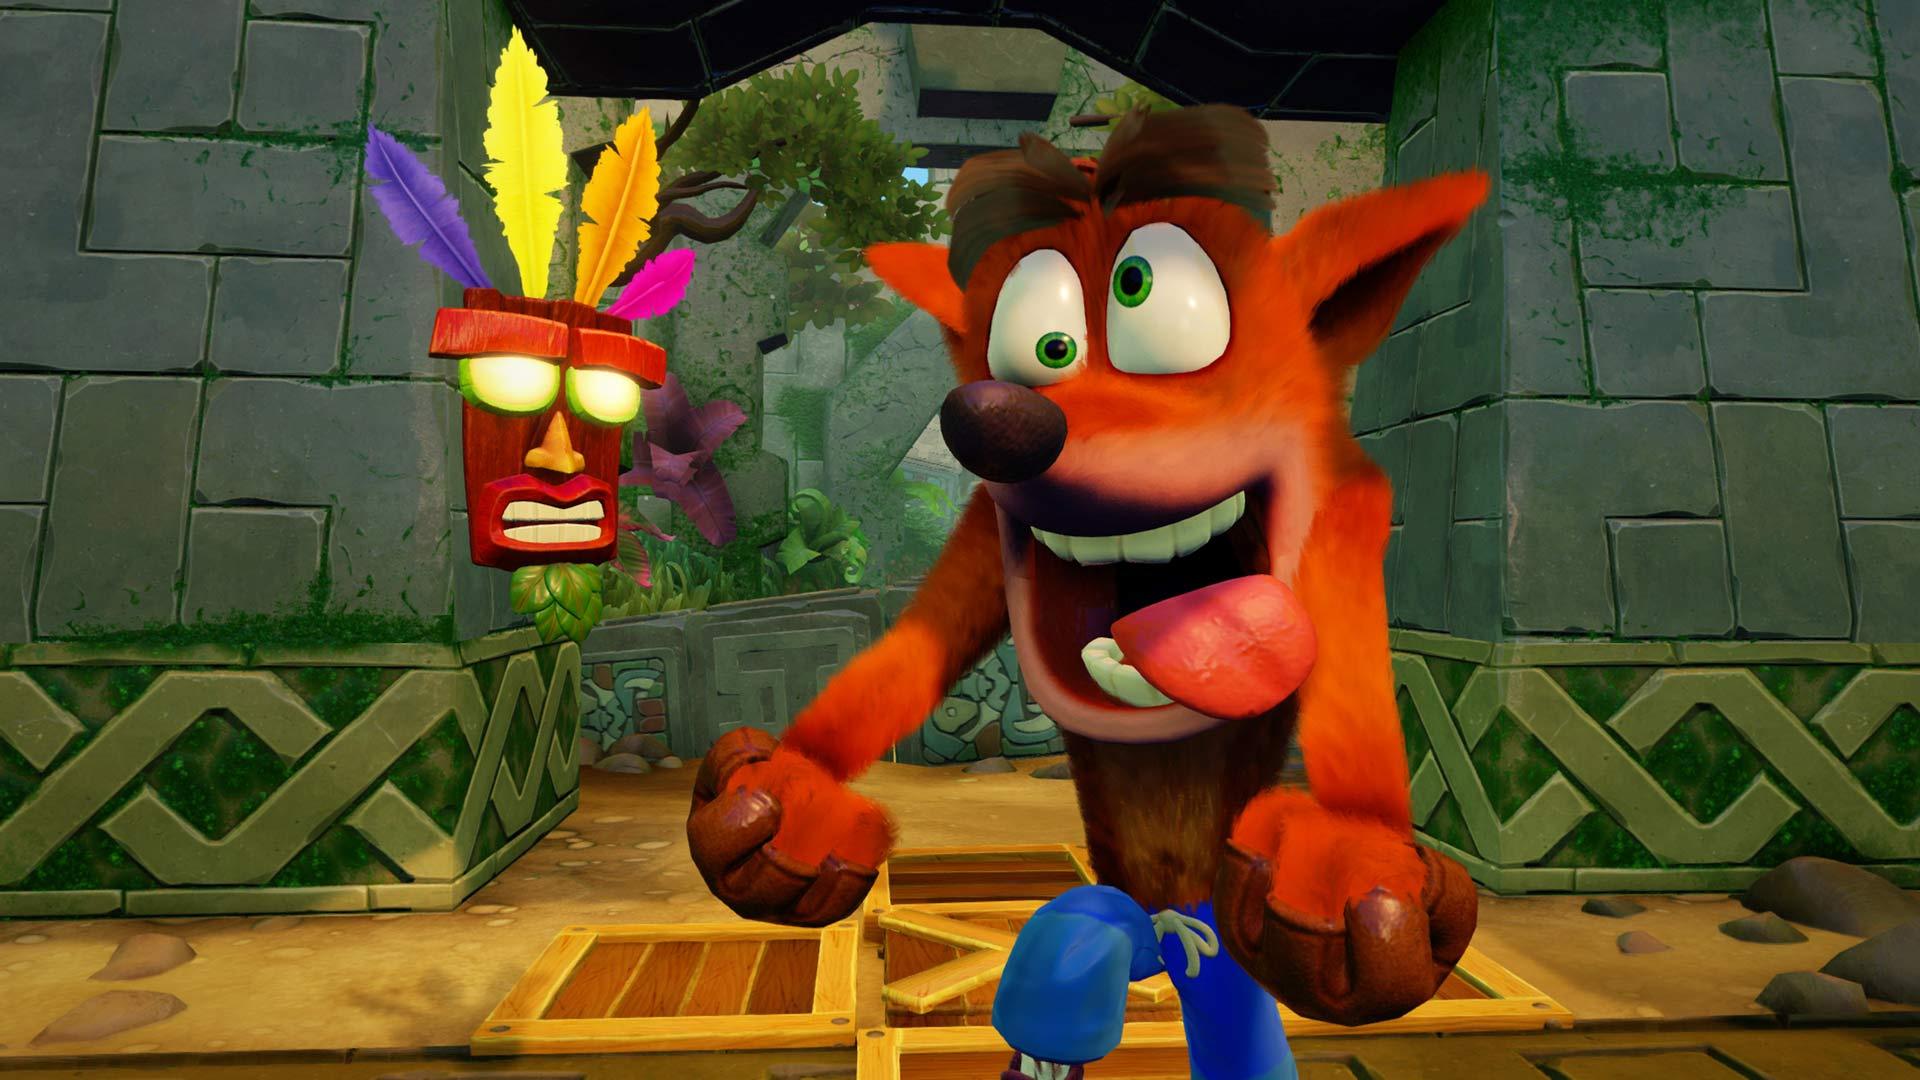 Утечка: Activision готовит анонс Crash Bandicoot 4: It's About Time